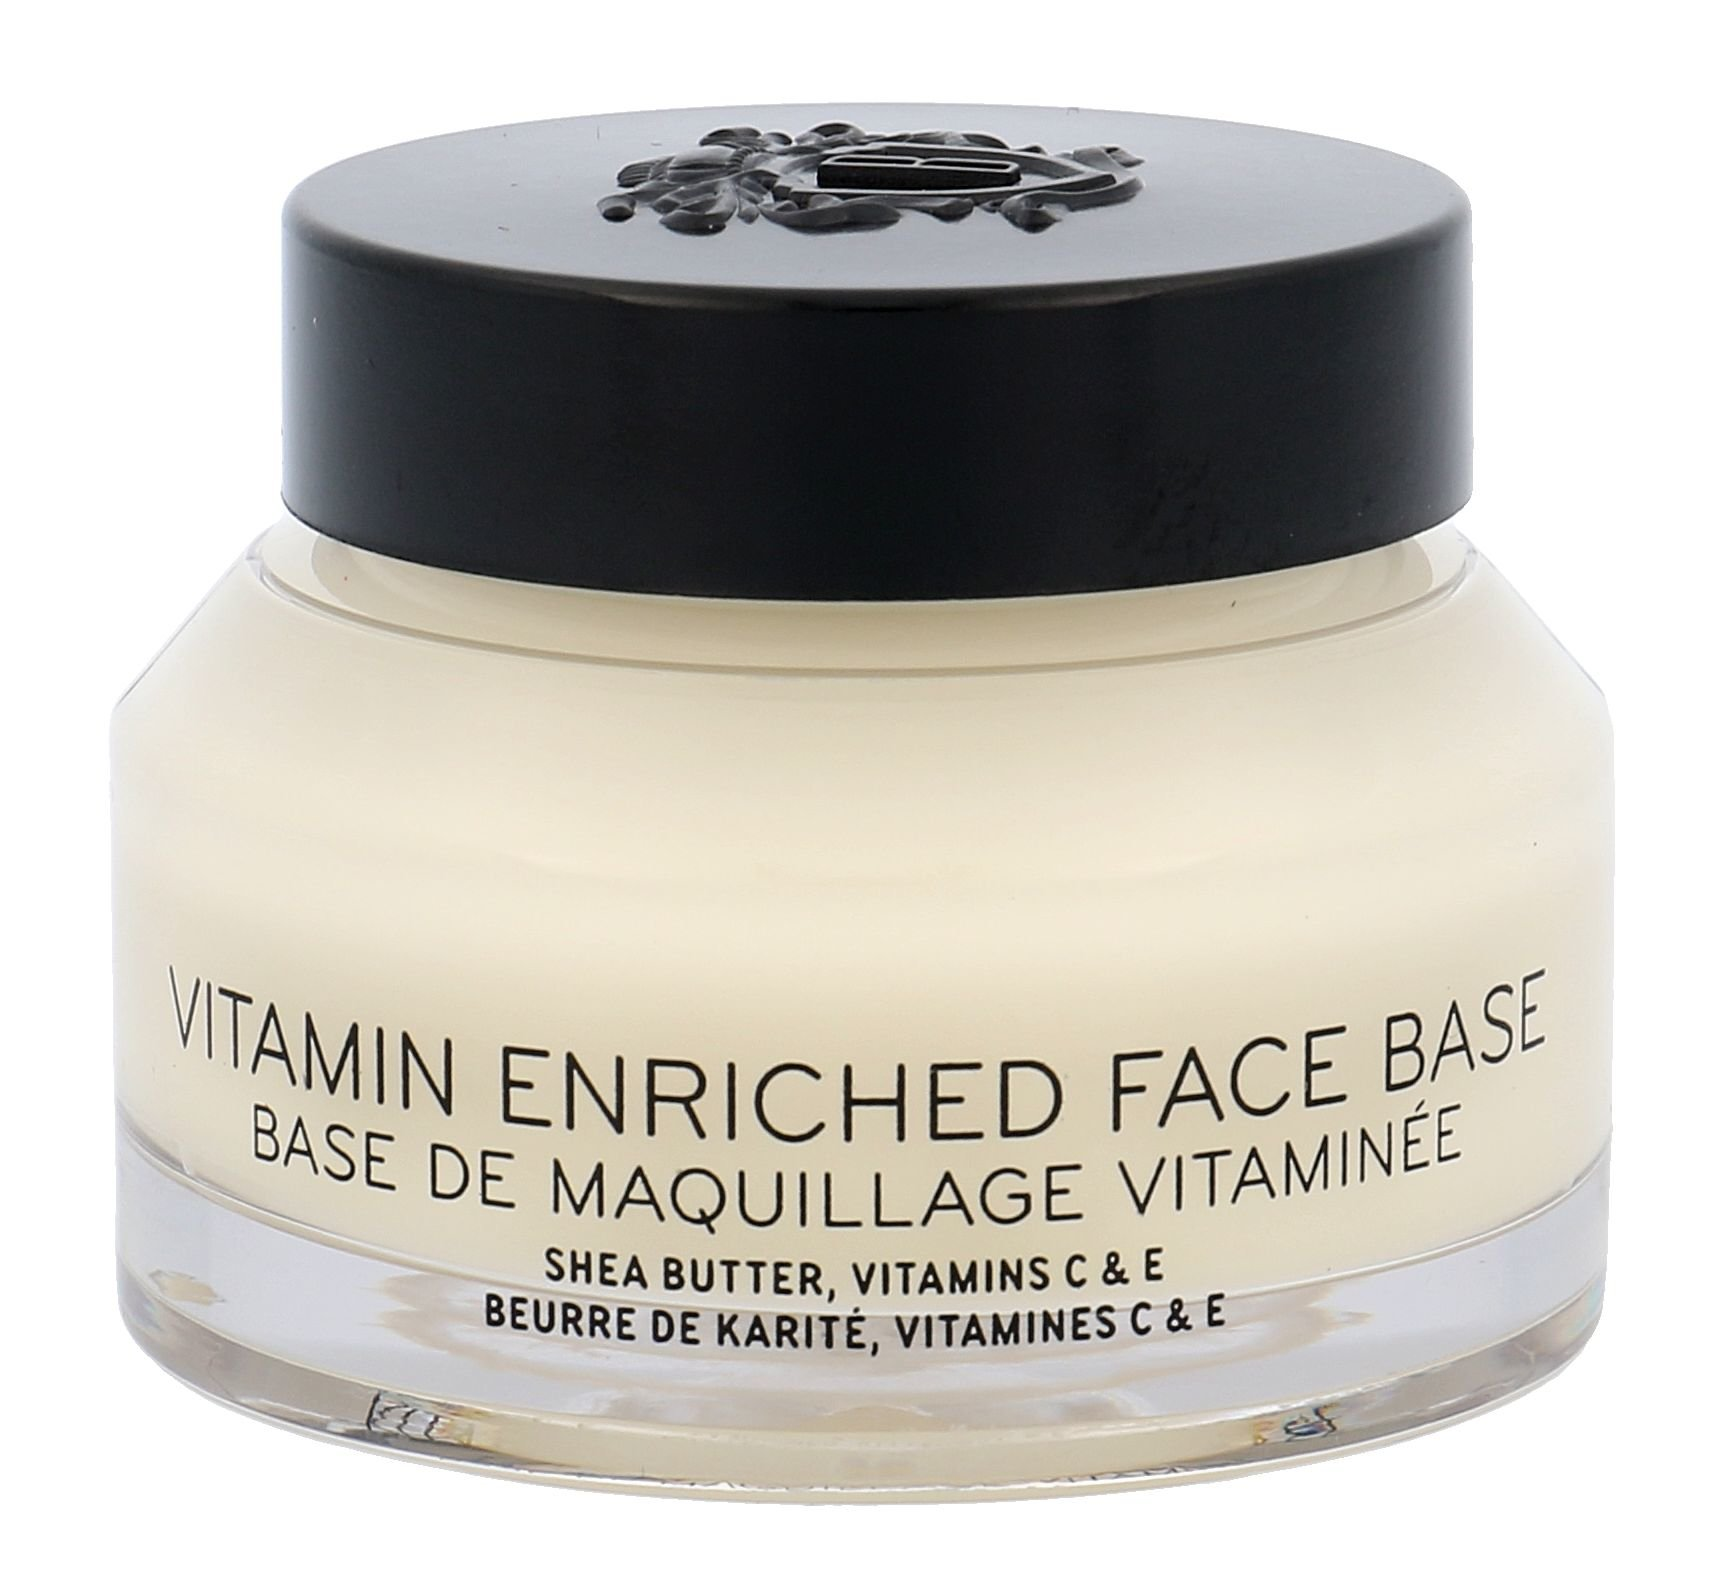 Bobbi Brown Vitamin Enriched Face Base Cosmetic 50ml